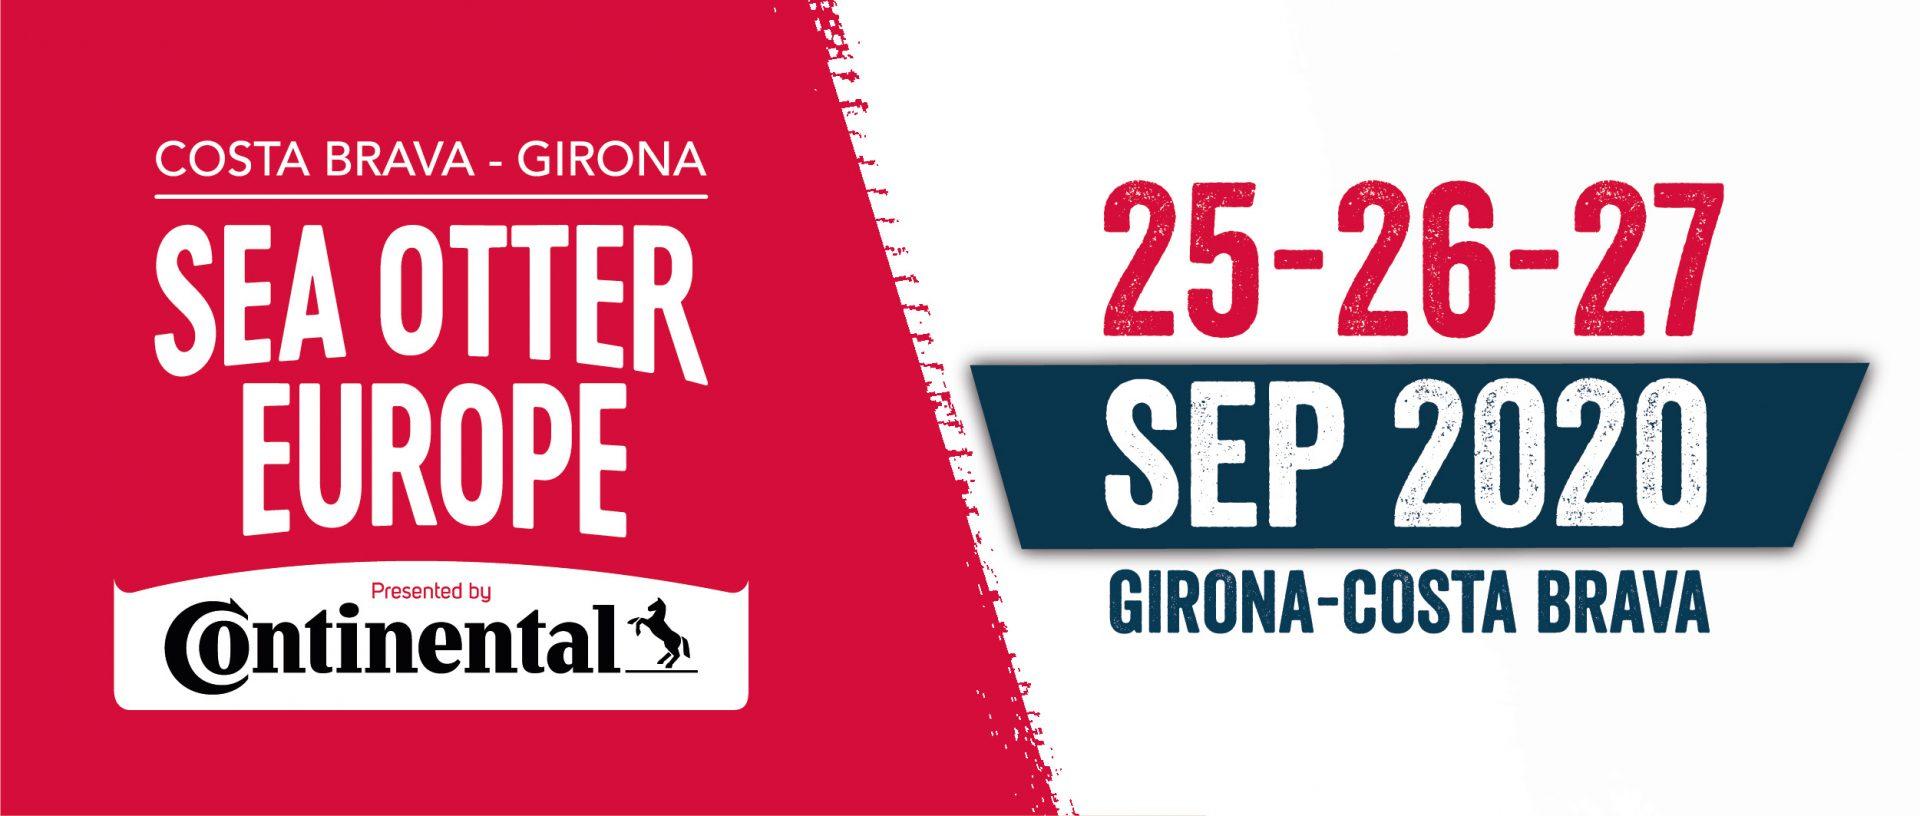 Sea Otter Europe Costa Brava-Girona